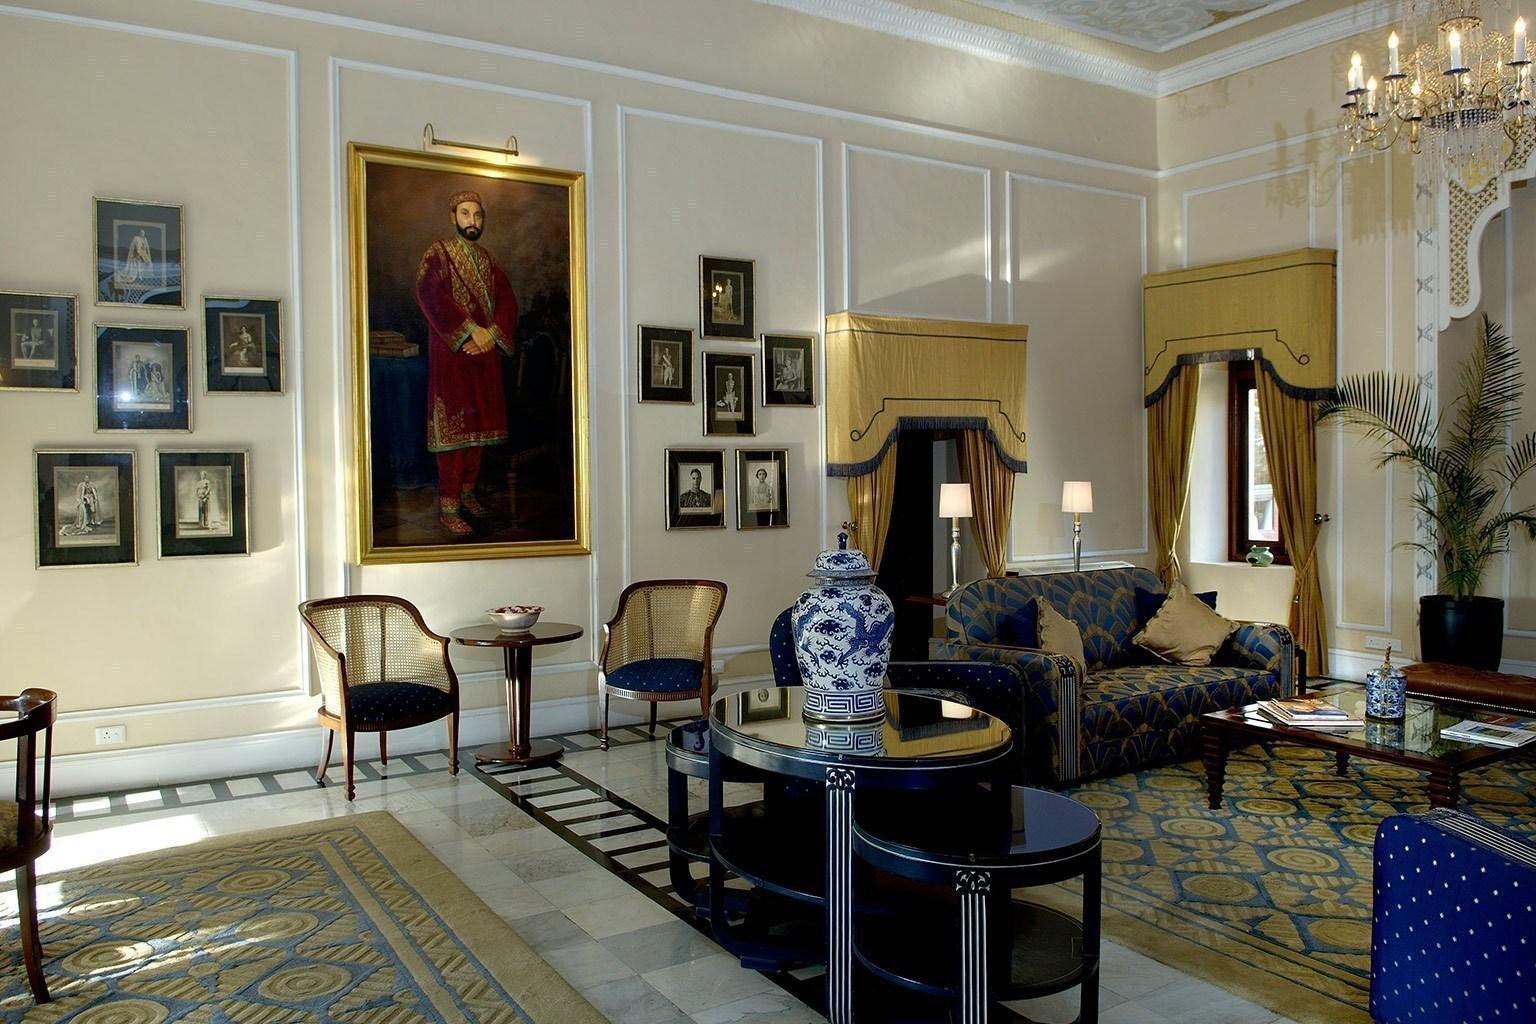 Ananda in the himalaya luxushotels bei designreisen